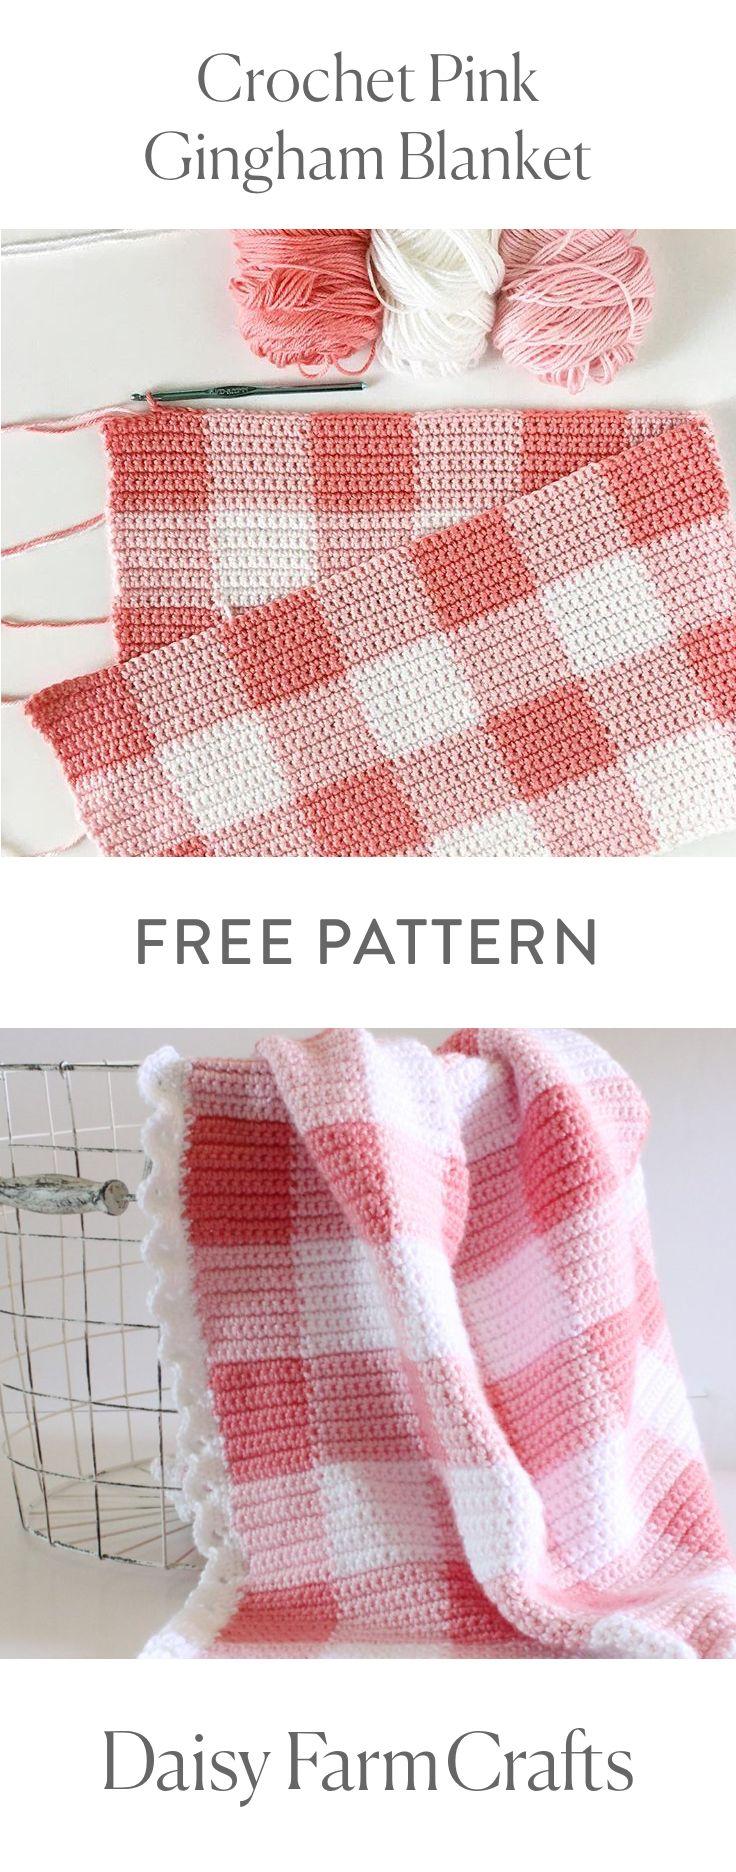 5117 best crochet images on Pinterest   Hand crafts, Knit crochet ...